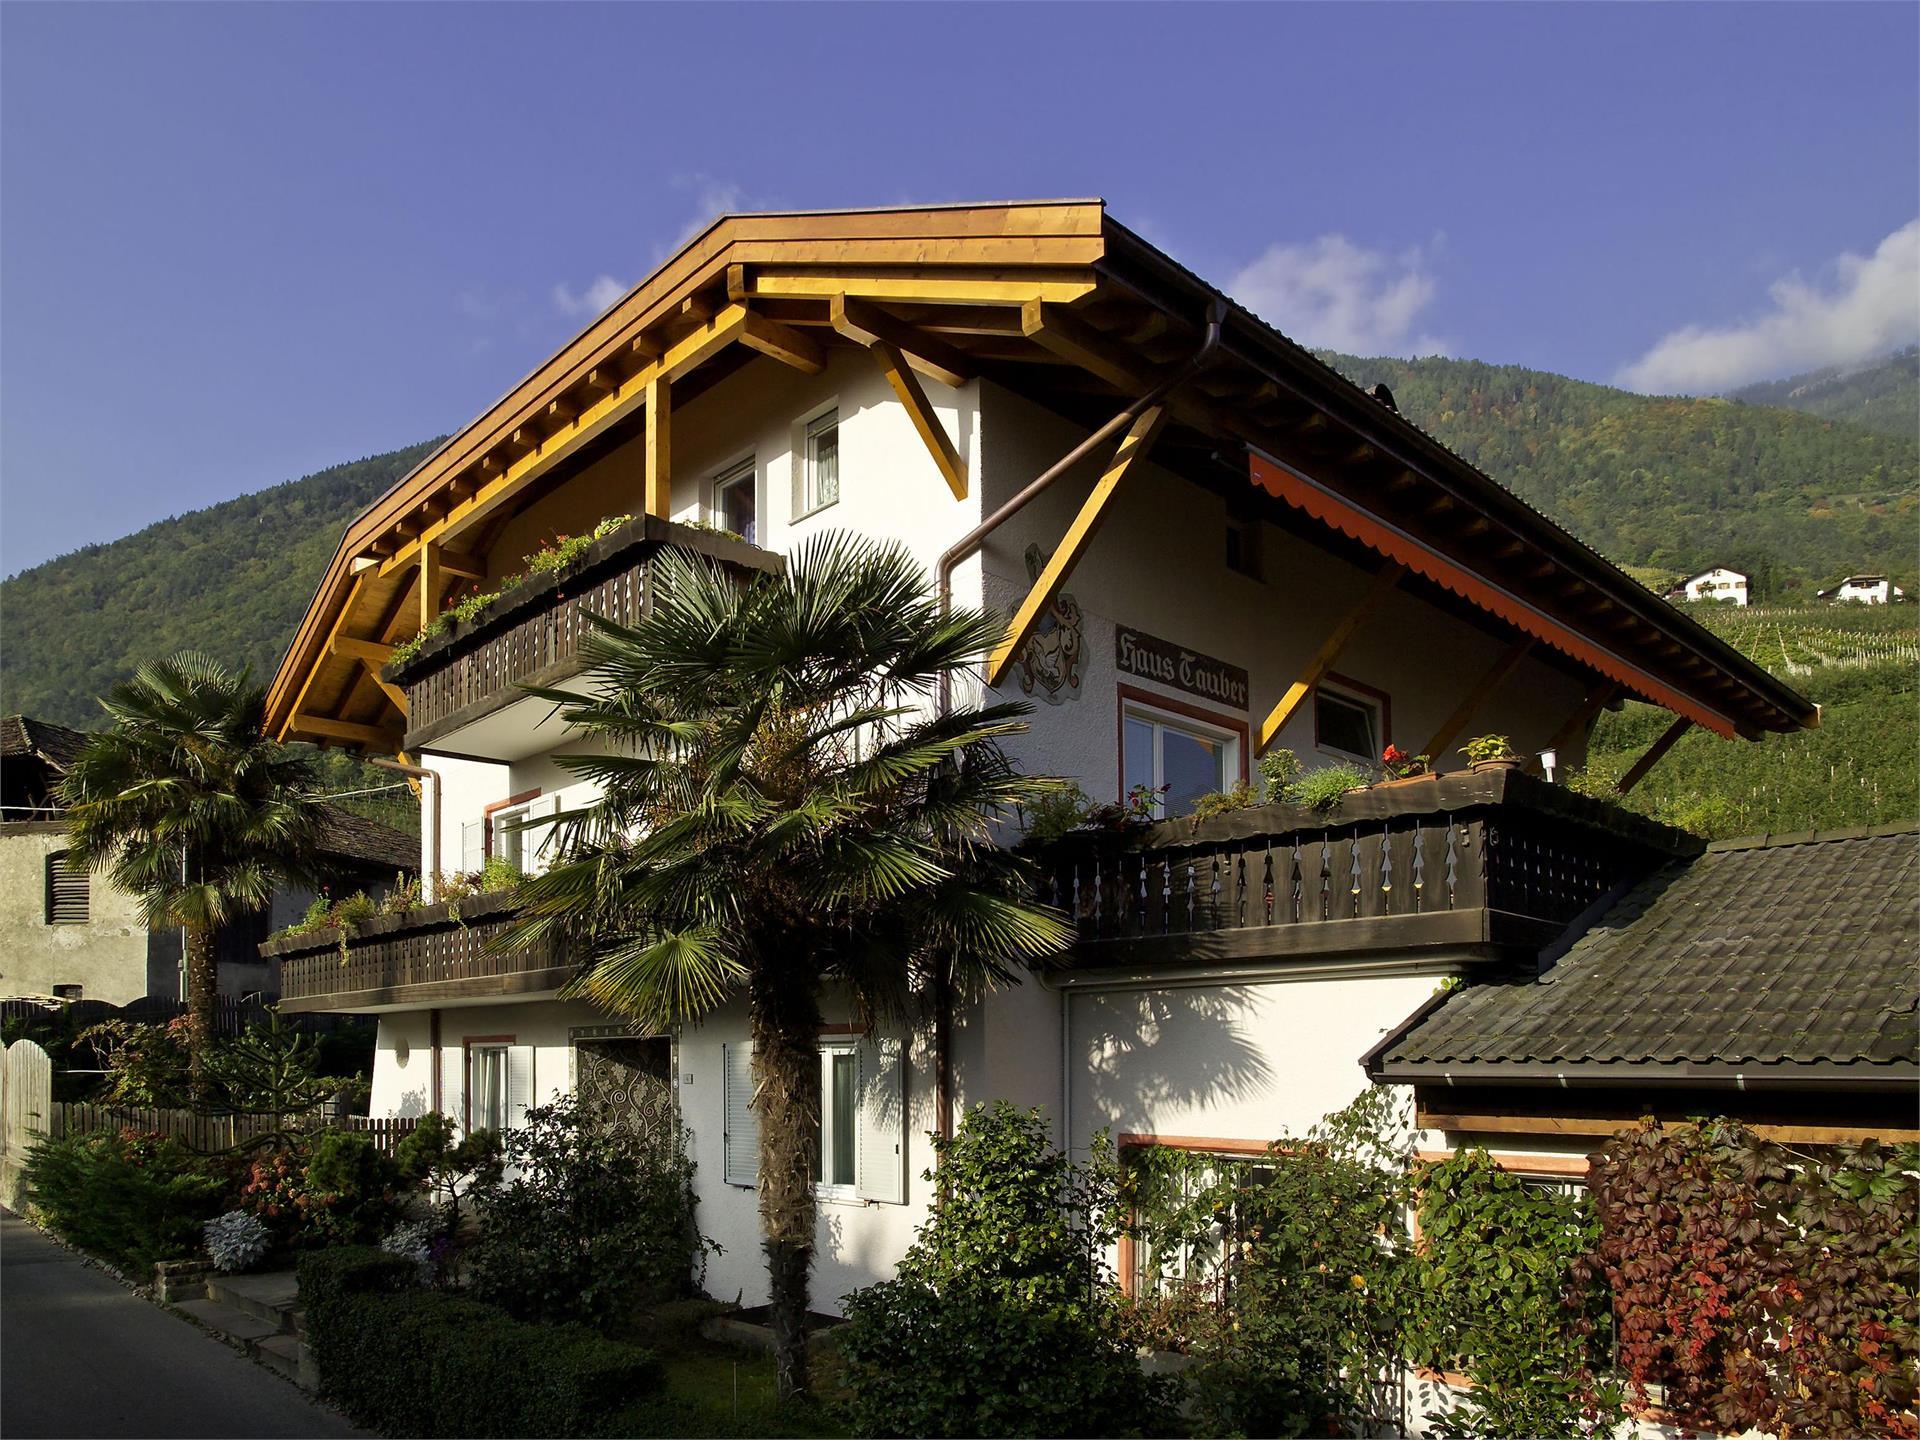 Haus Tauber